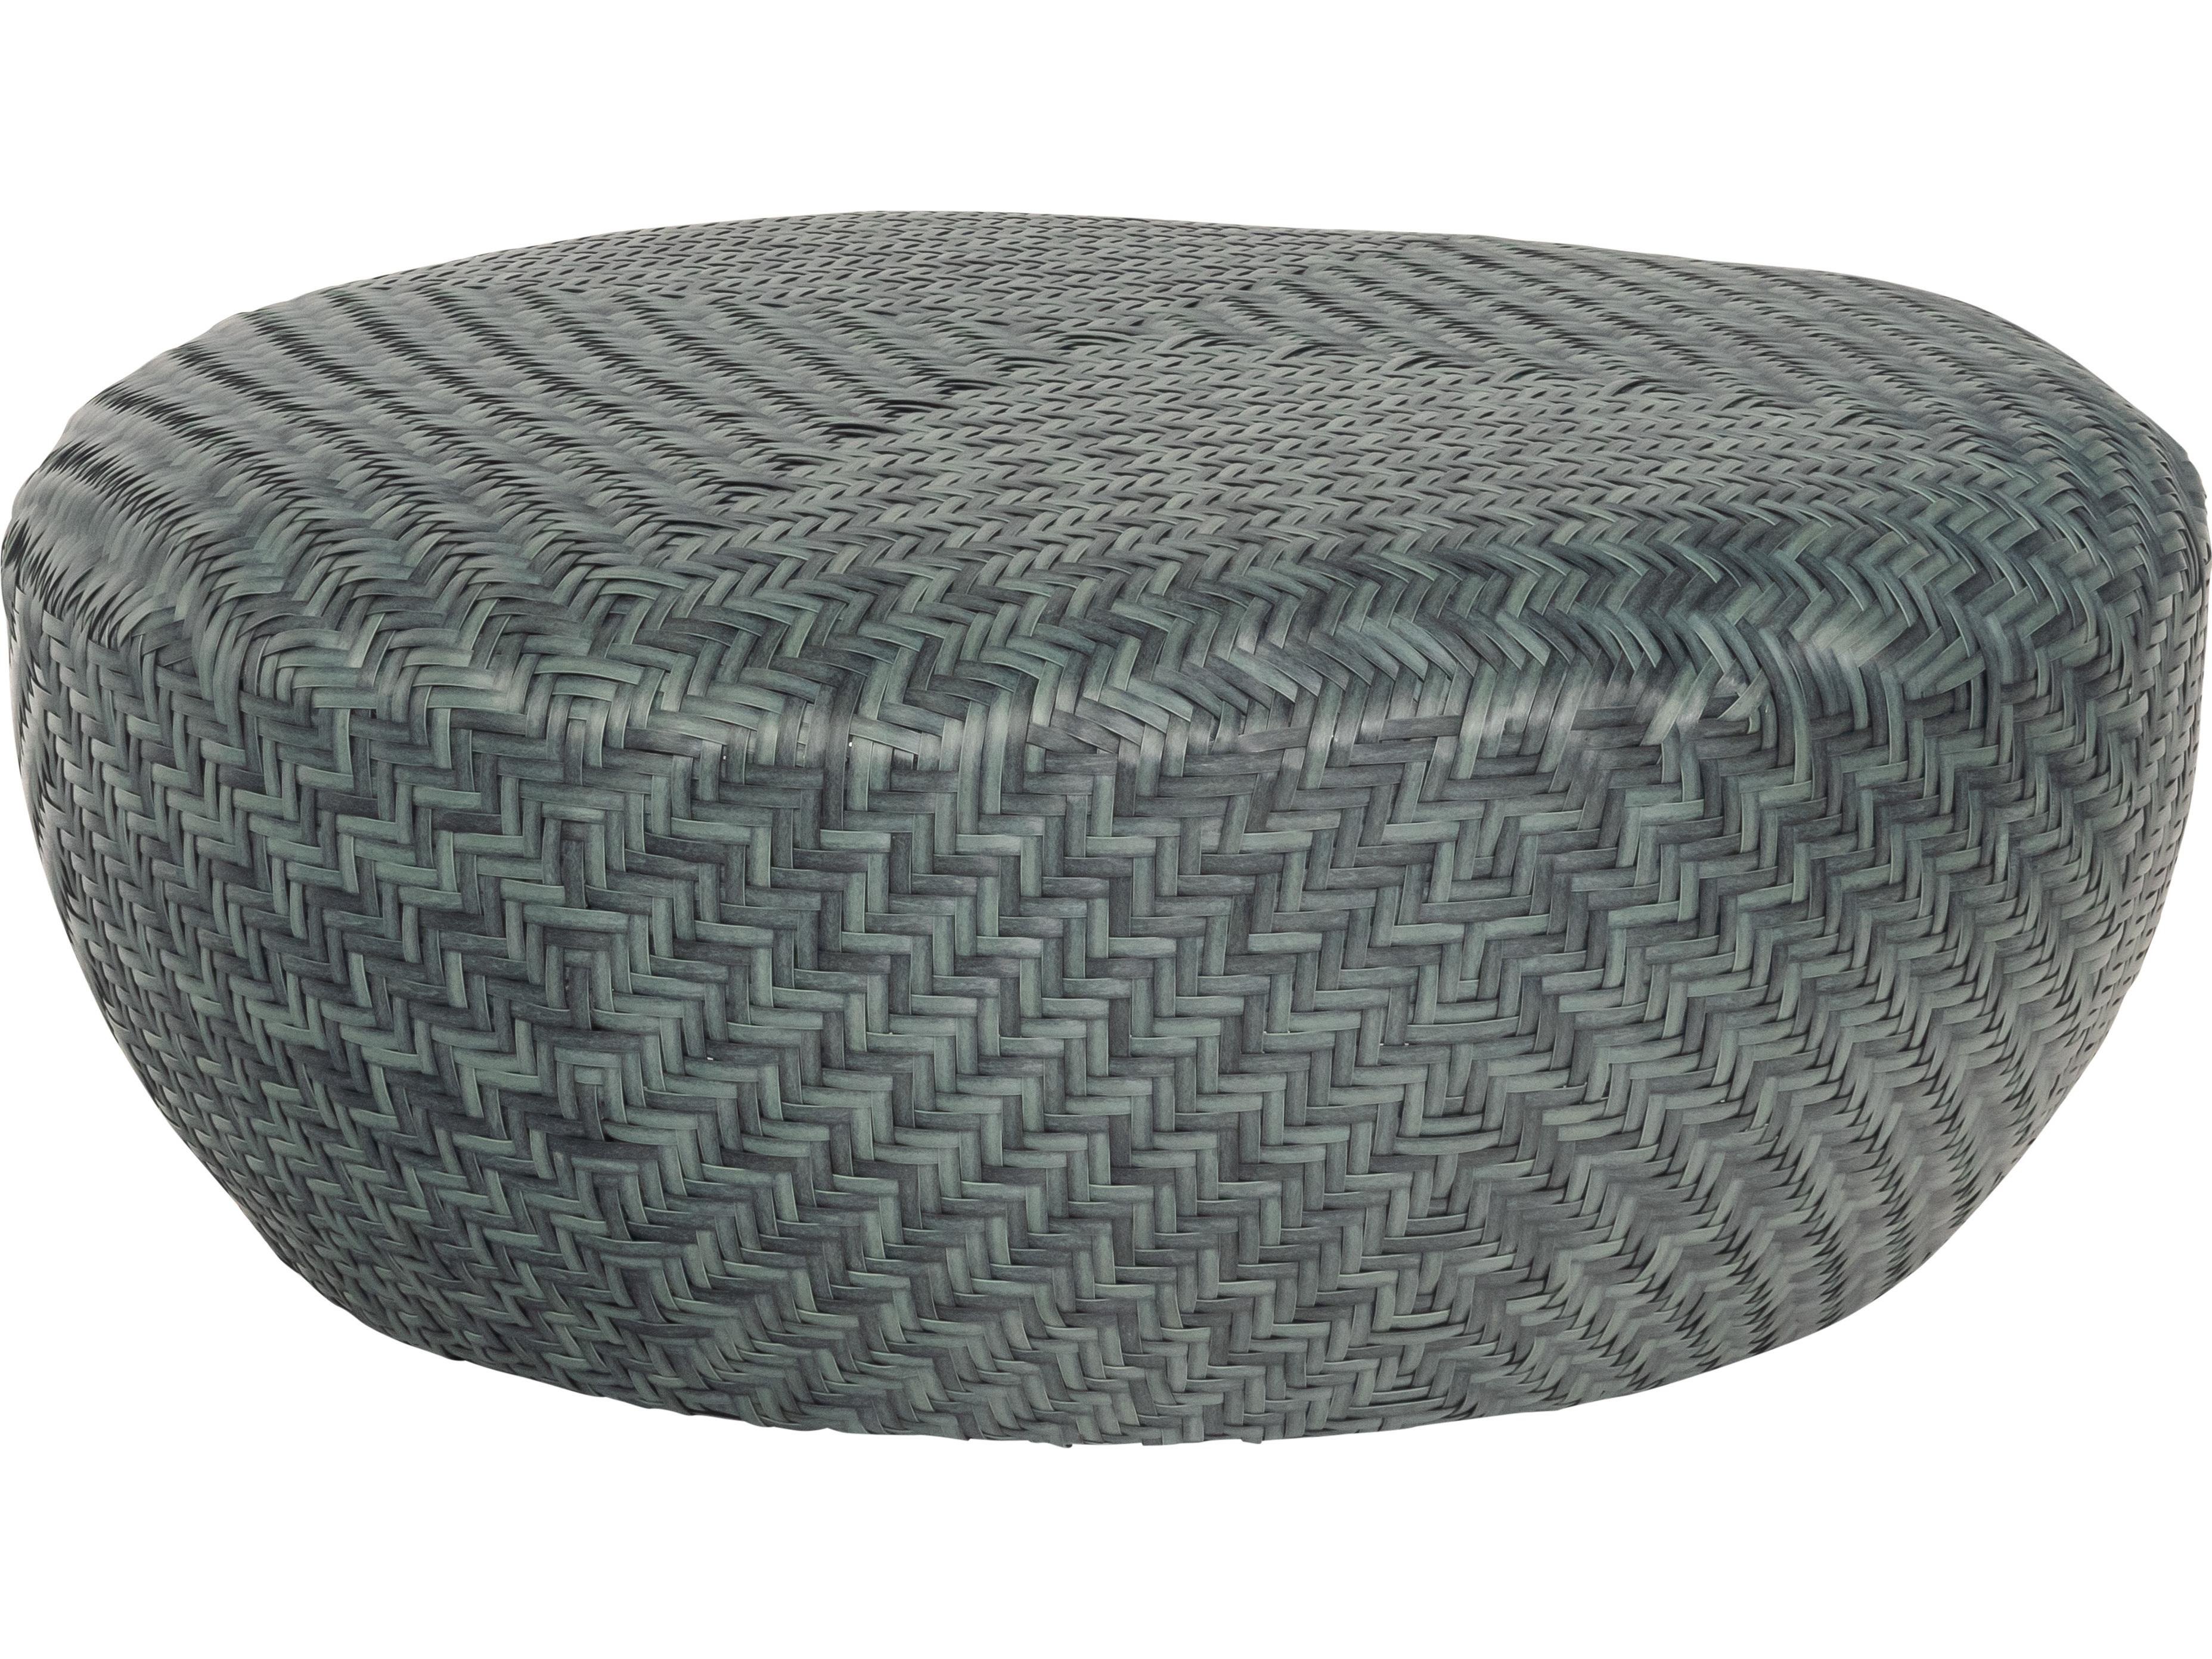 Woodard Trident Wicker Cobalt Gray 36 Wide Round Coffee Table Ottoman S680211